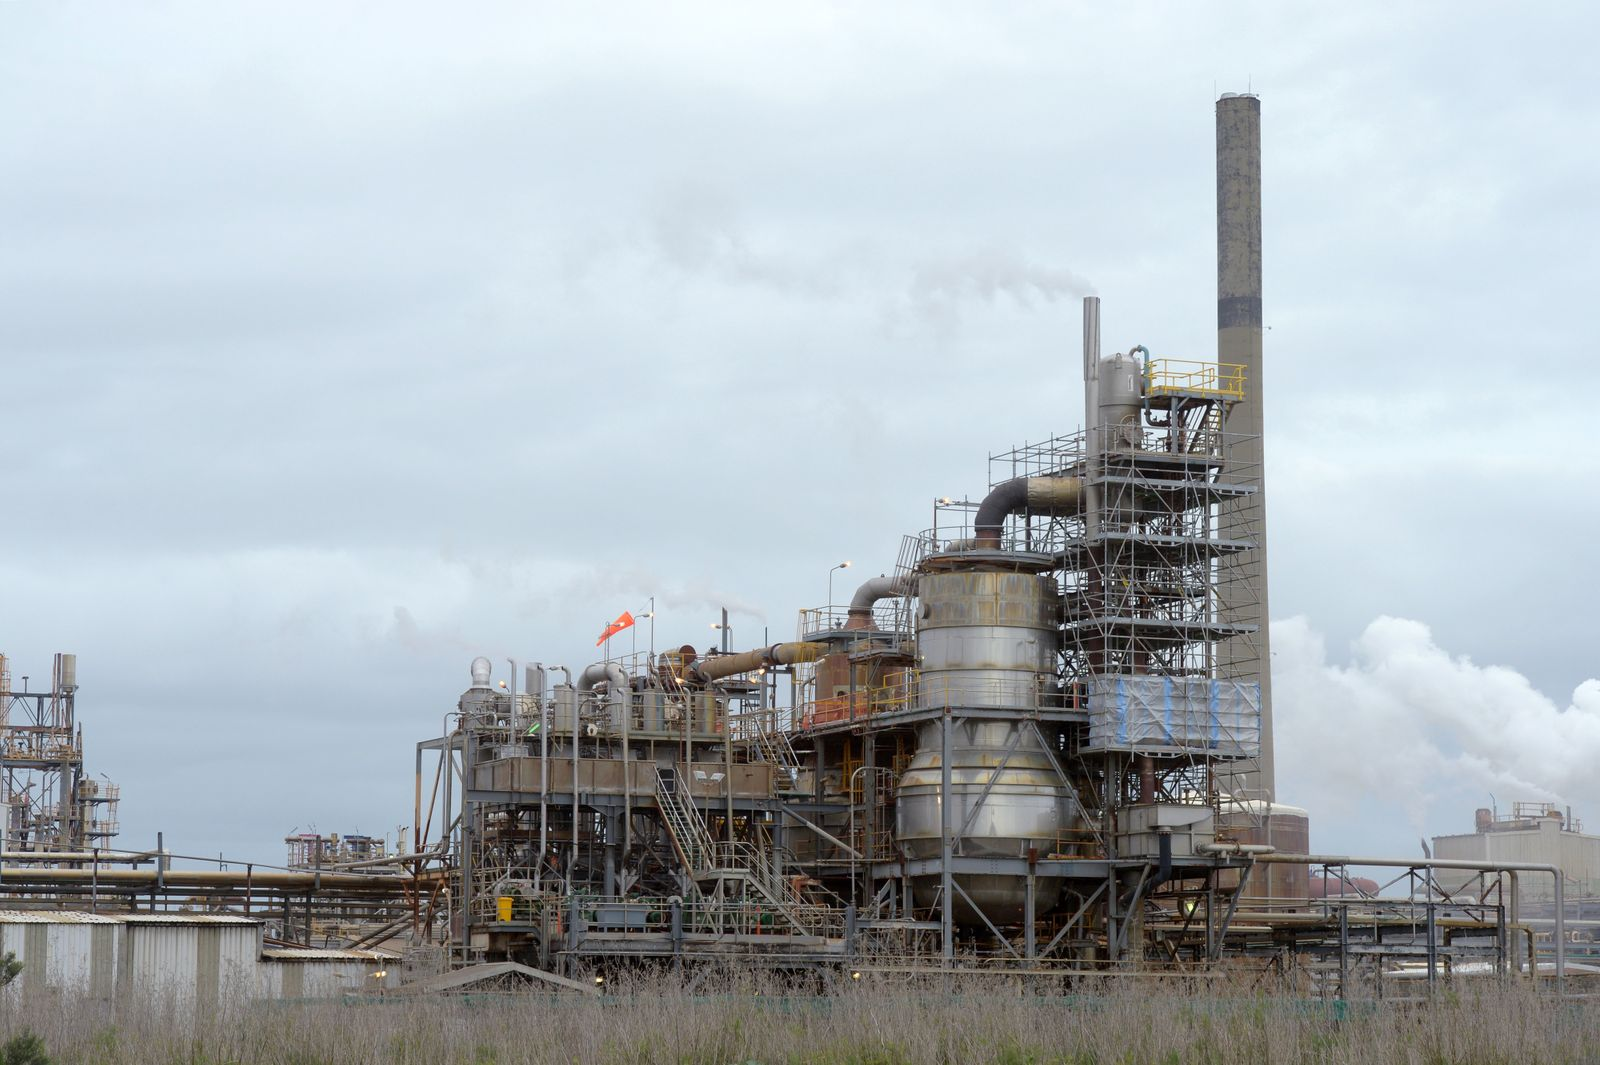 General Views of the Kwinana Industrial Area in Western Australia